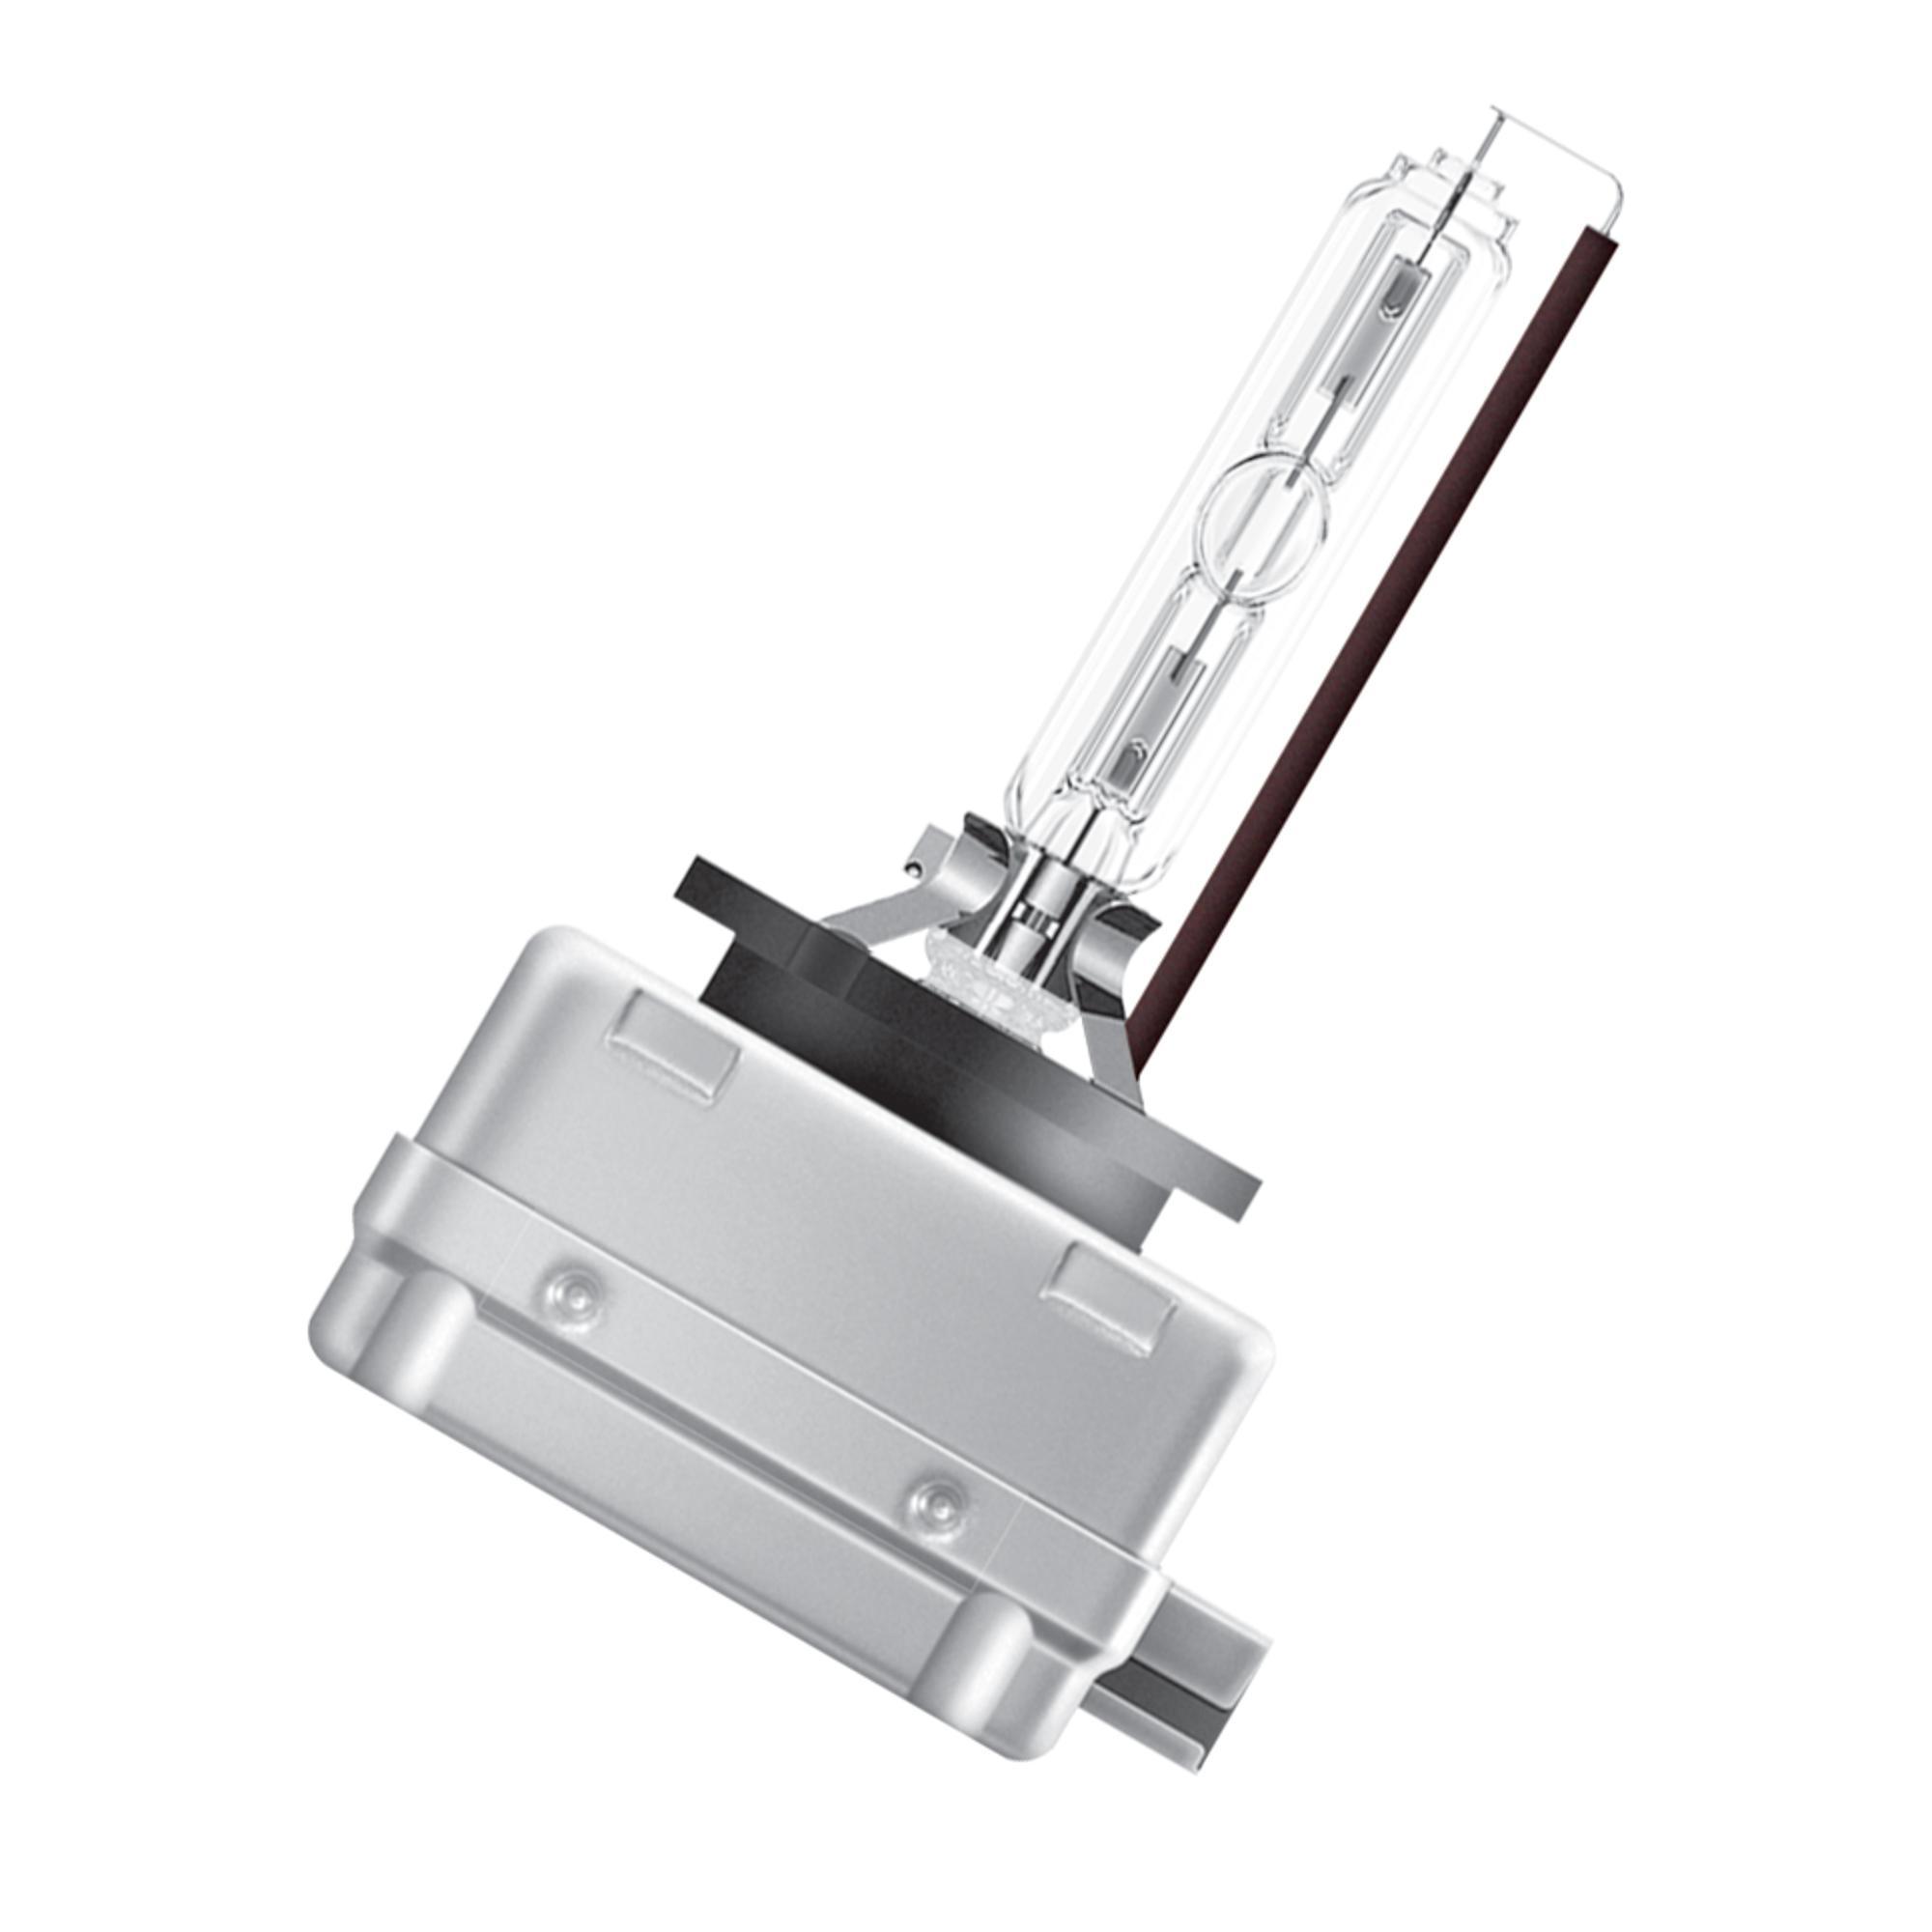 Polttimo, kaukovalo OSRAM 66140 asiantuntemusta